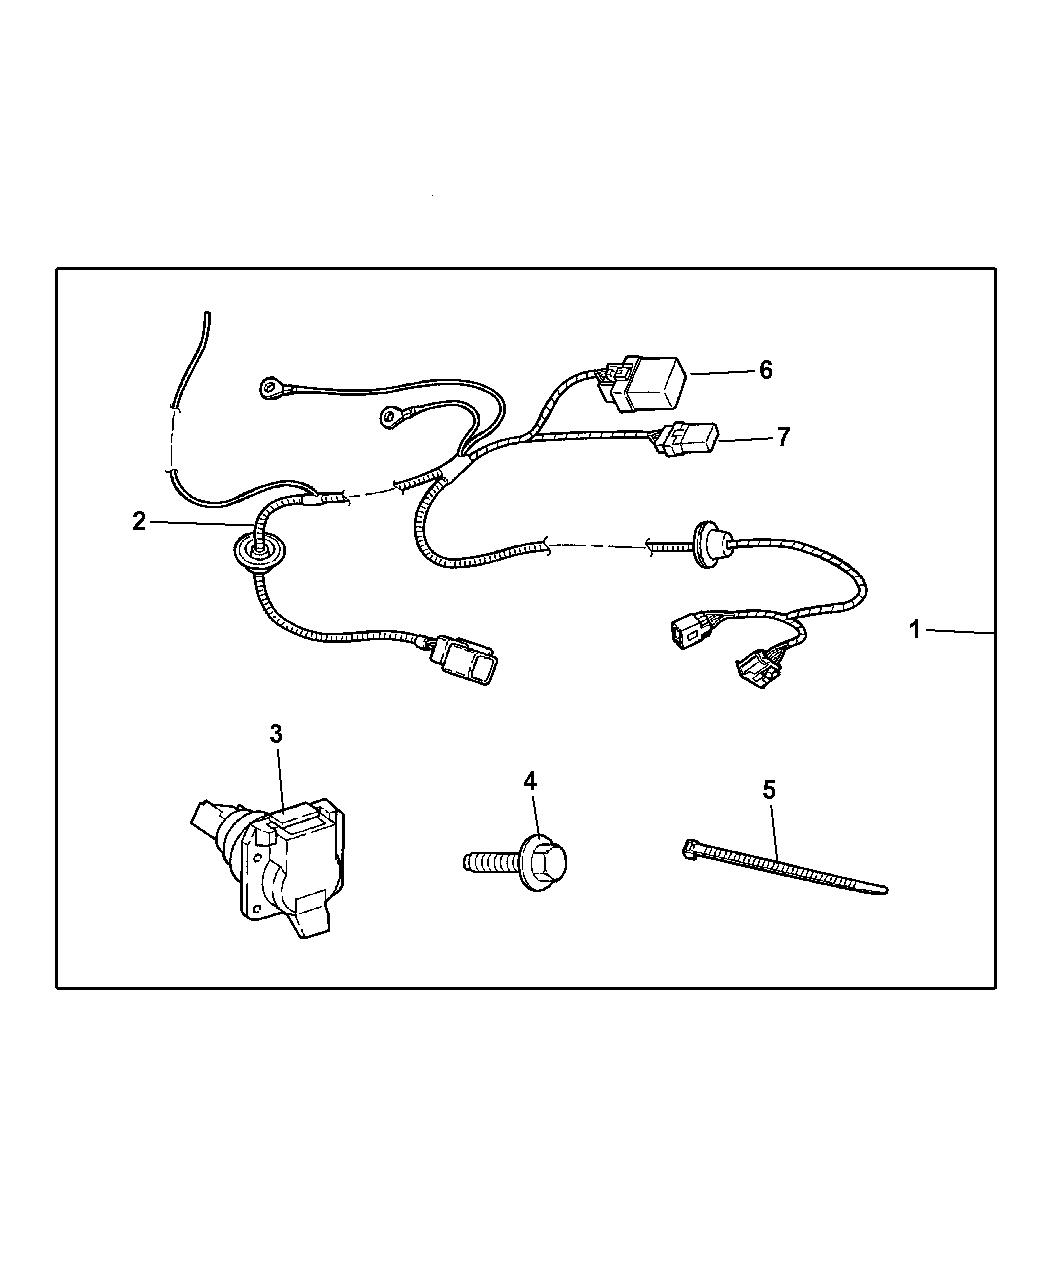 2009 Dodge Charger Wiring Kit Trailer Tow Mopar Parts Giant Diagram Thumbnail 2